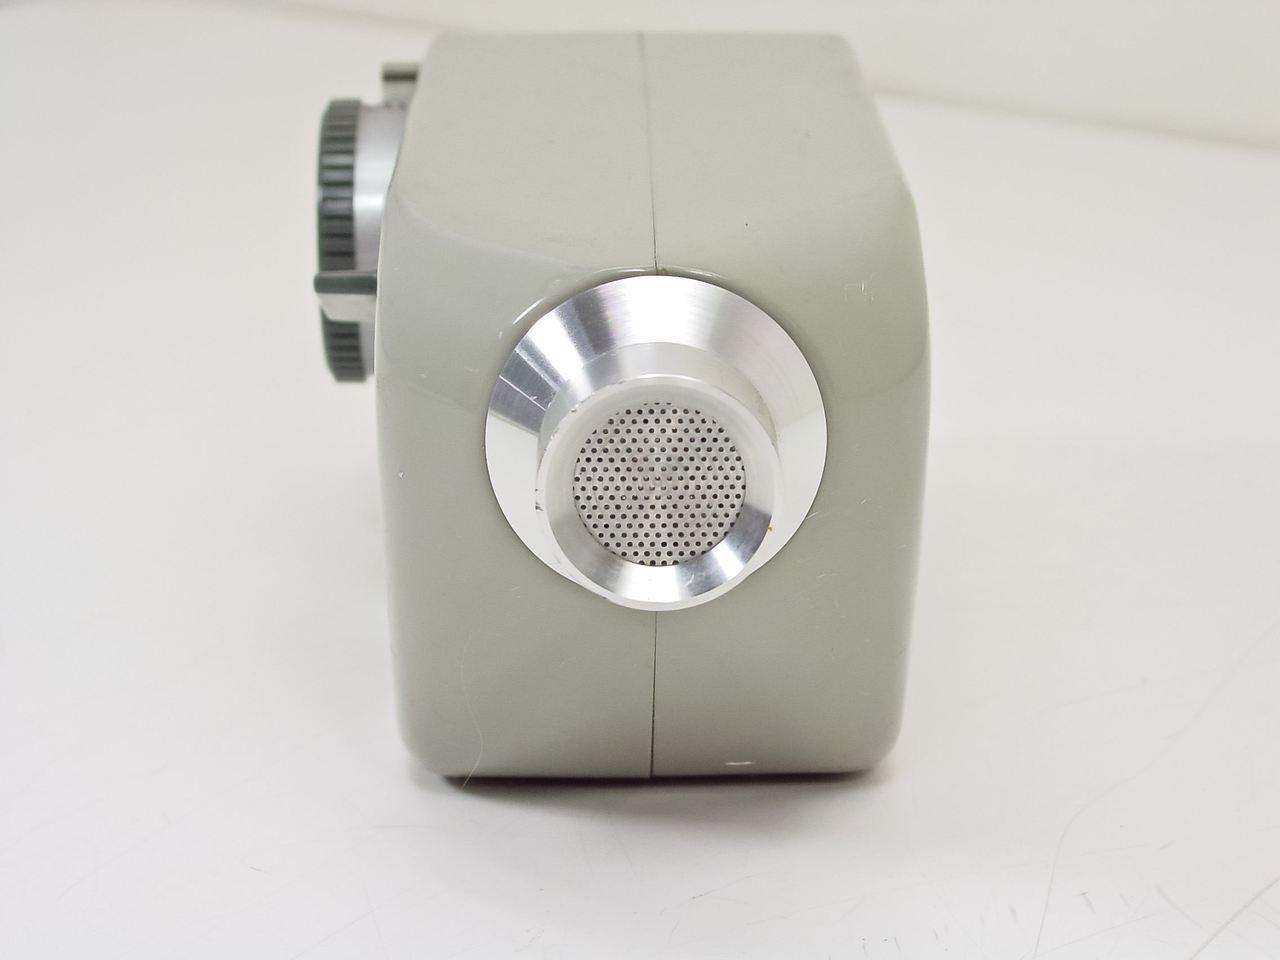 ADC SLM-100 Audio Dynamics Sound Level Meter